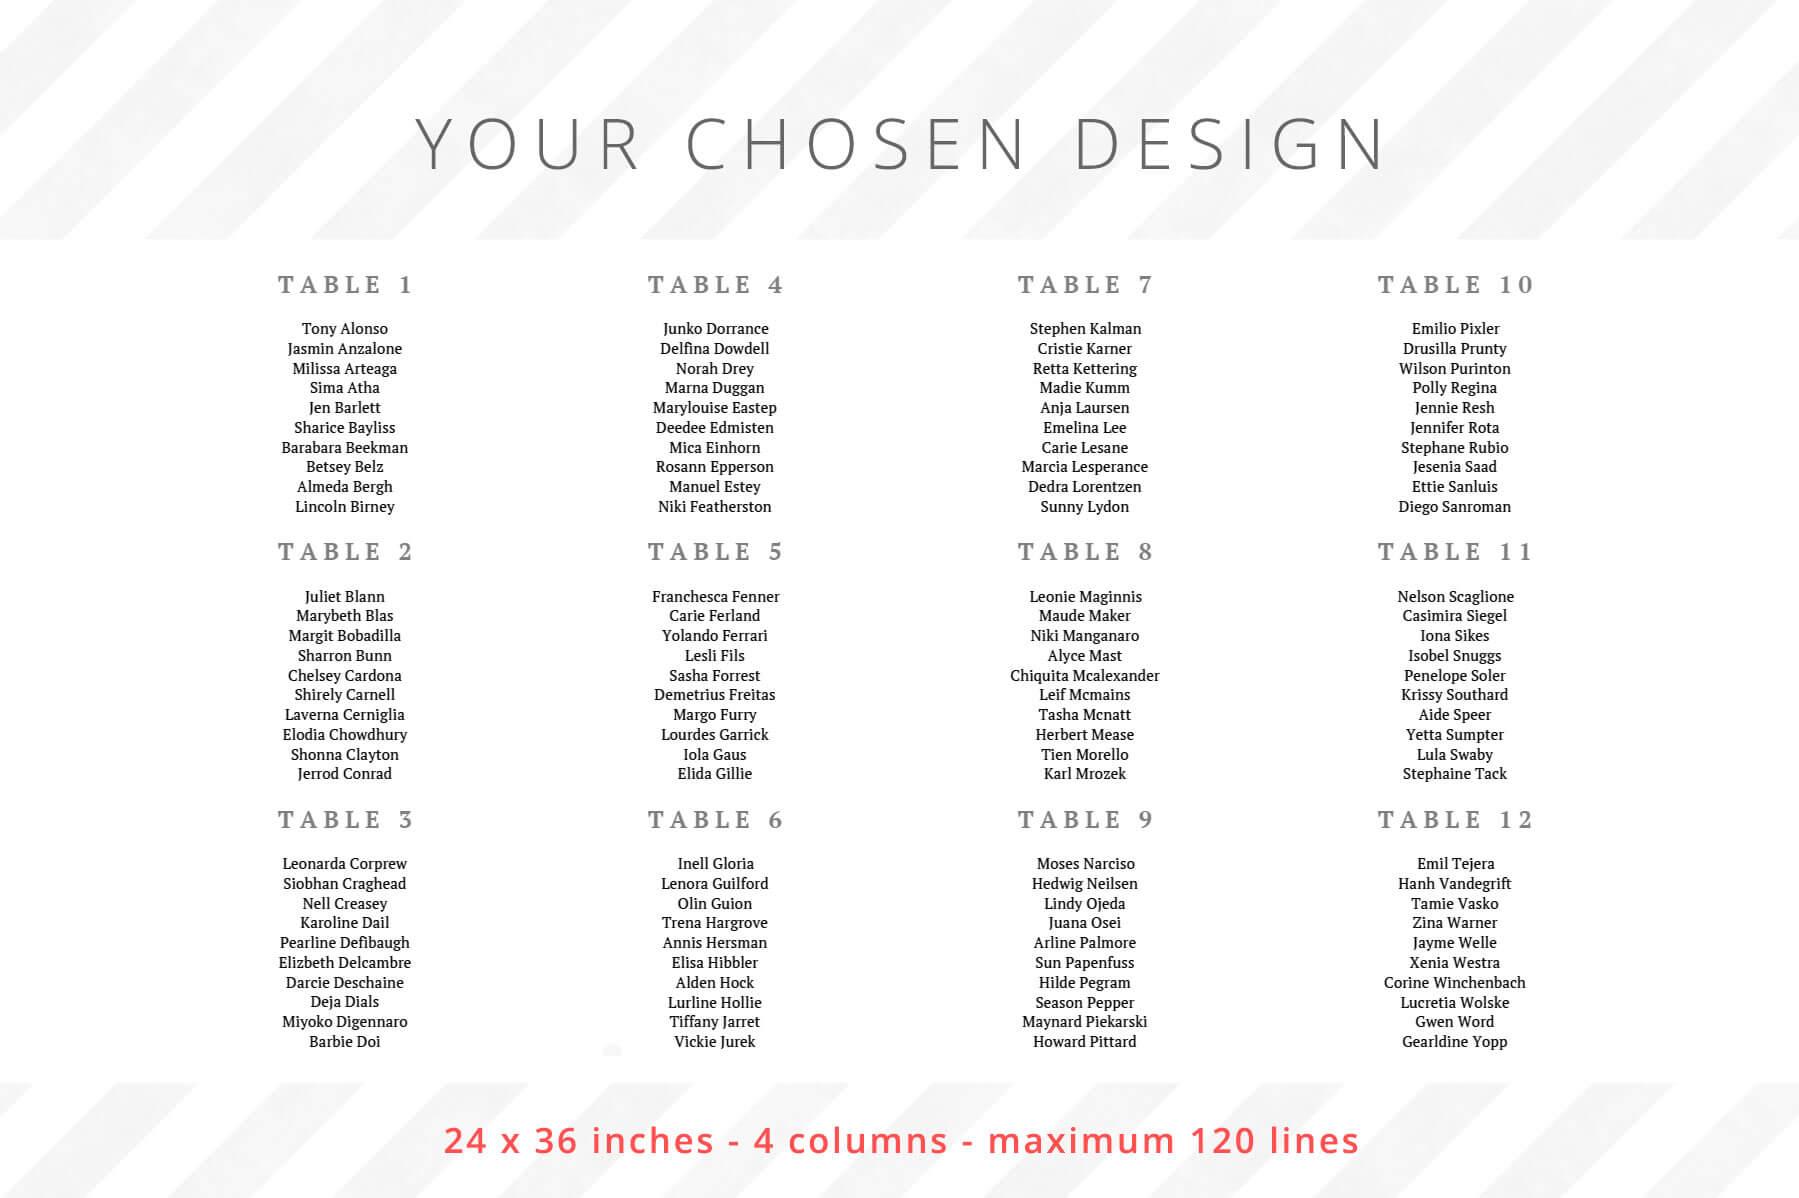 24 x 36 inches - 4 columns